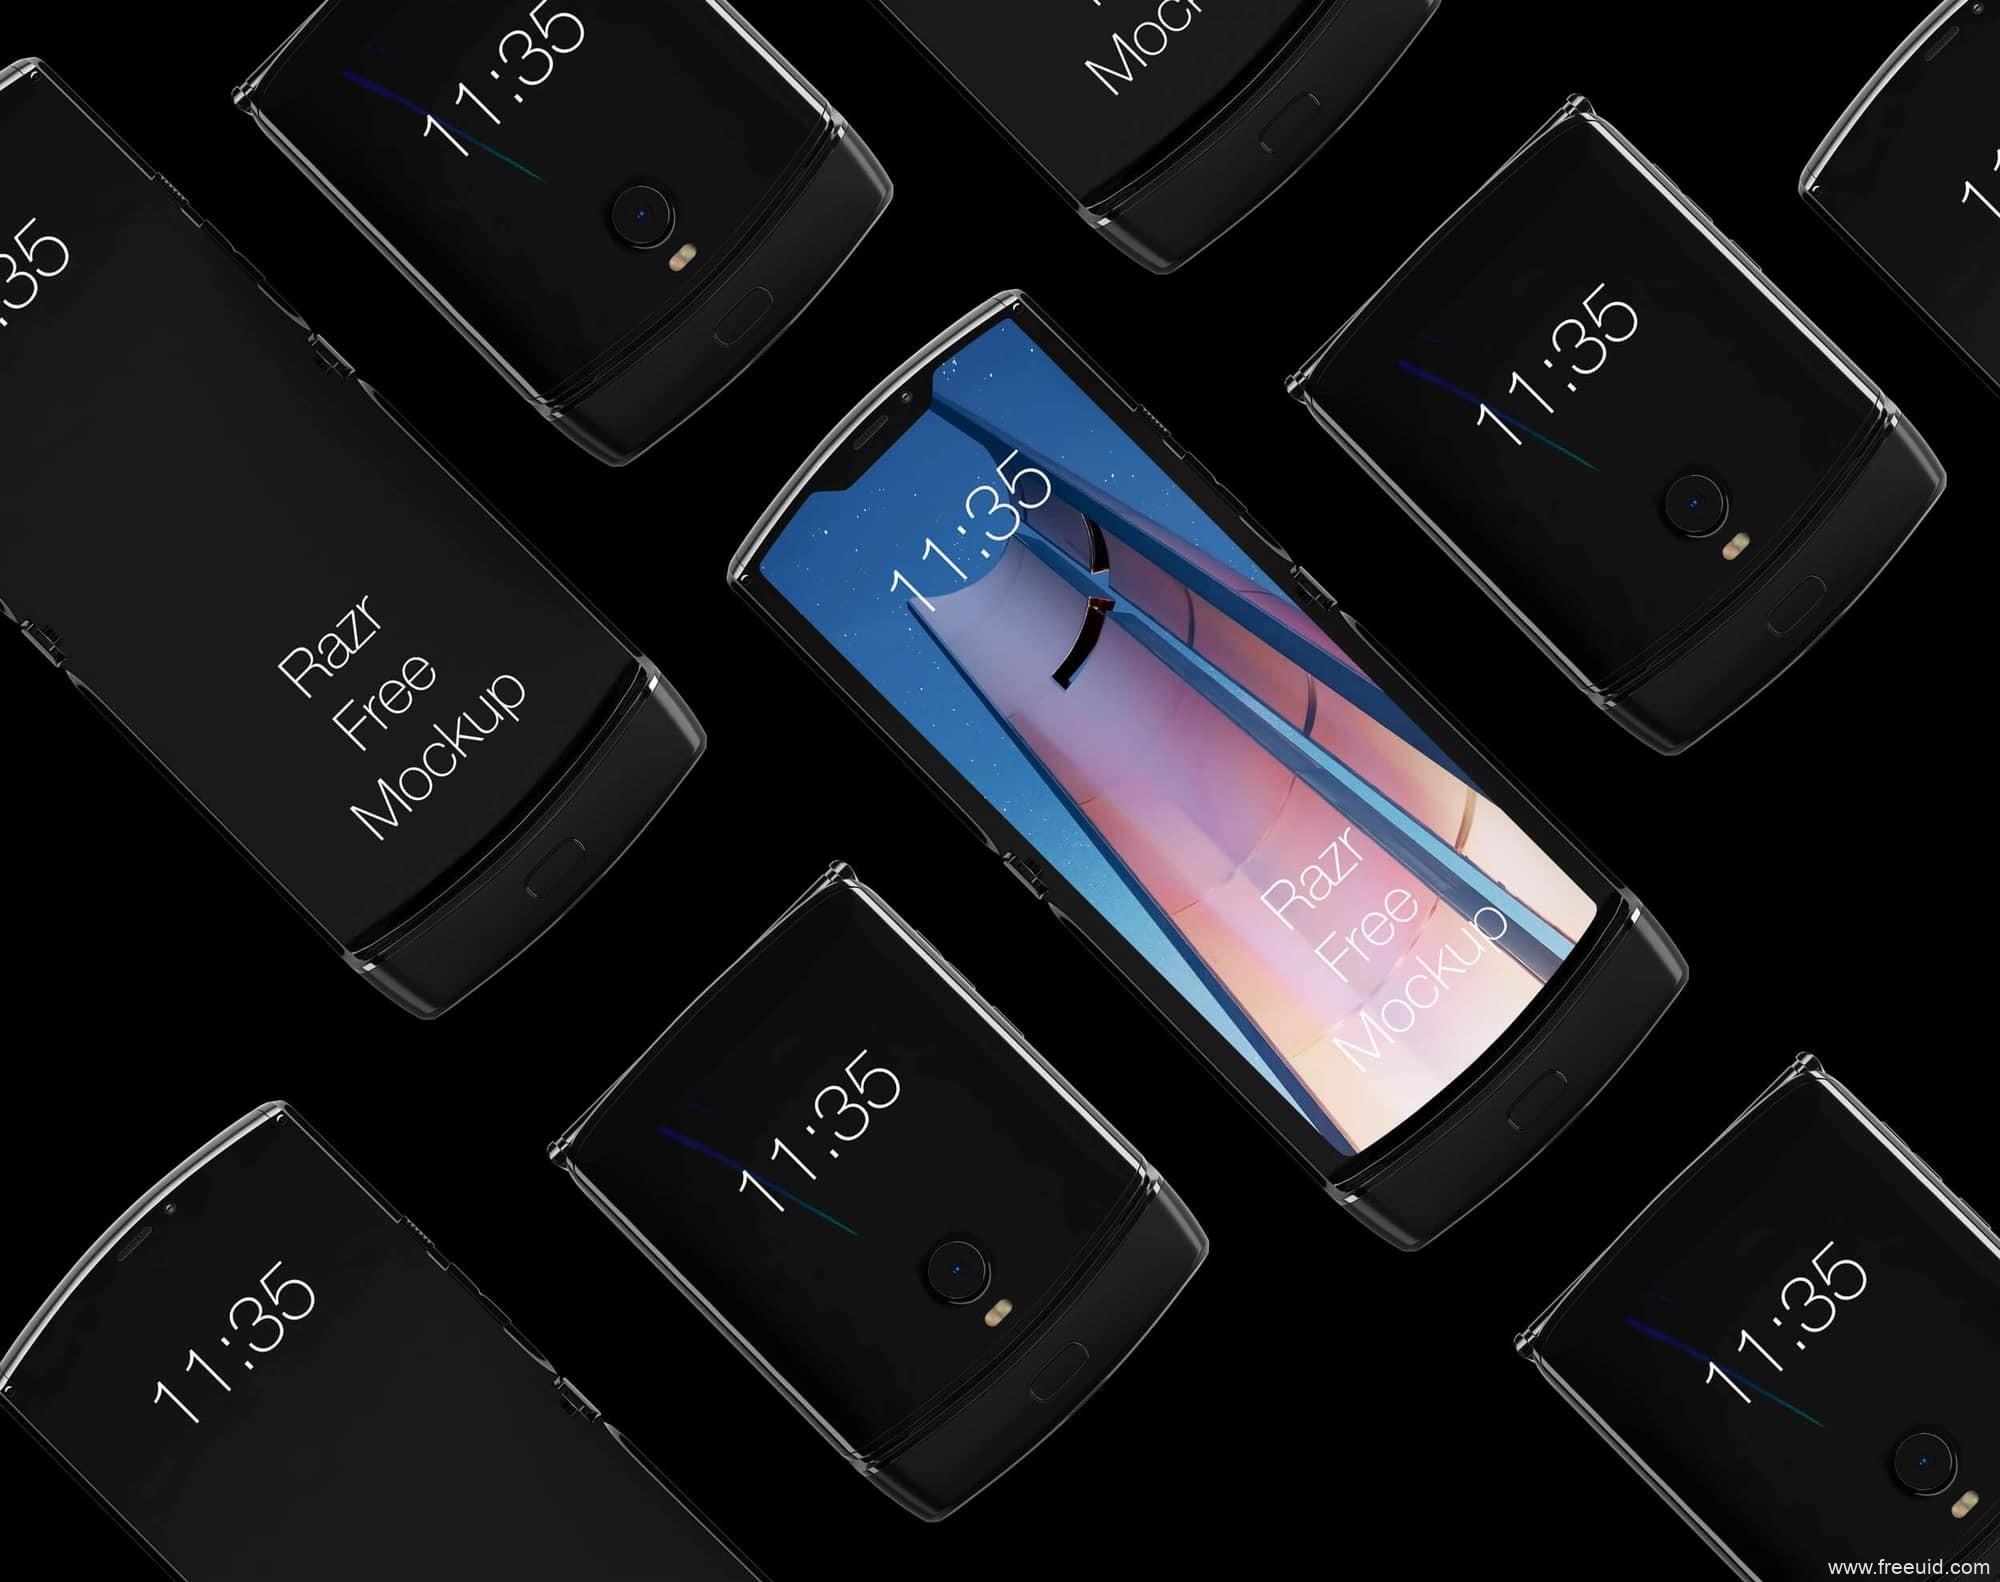 Motorola Razr Mockup,摩托罗拉Razr折叠屏手机样机mockup模板